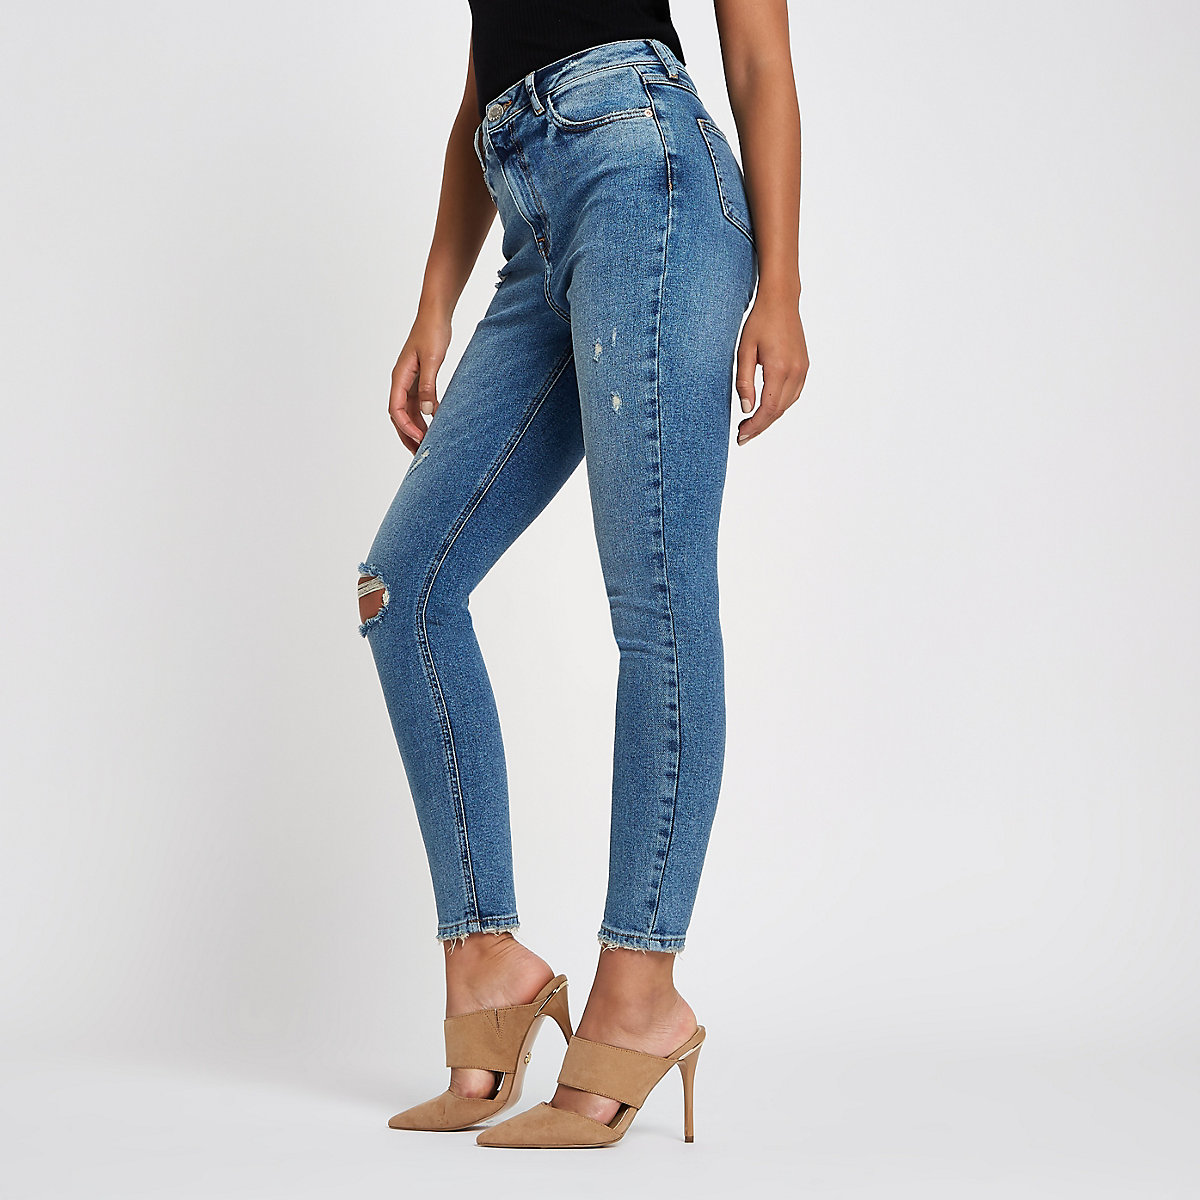 Mid blue Original Skinny ripped jeans